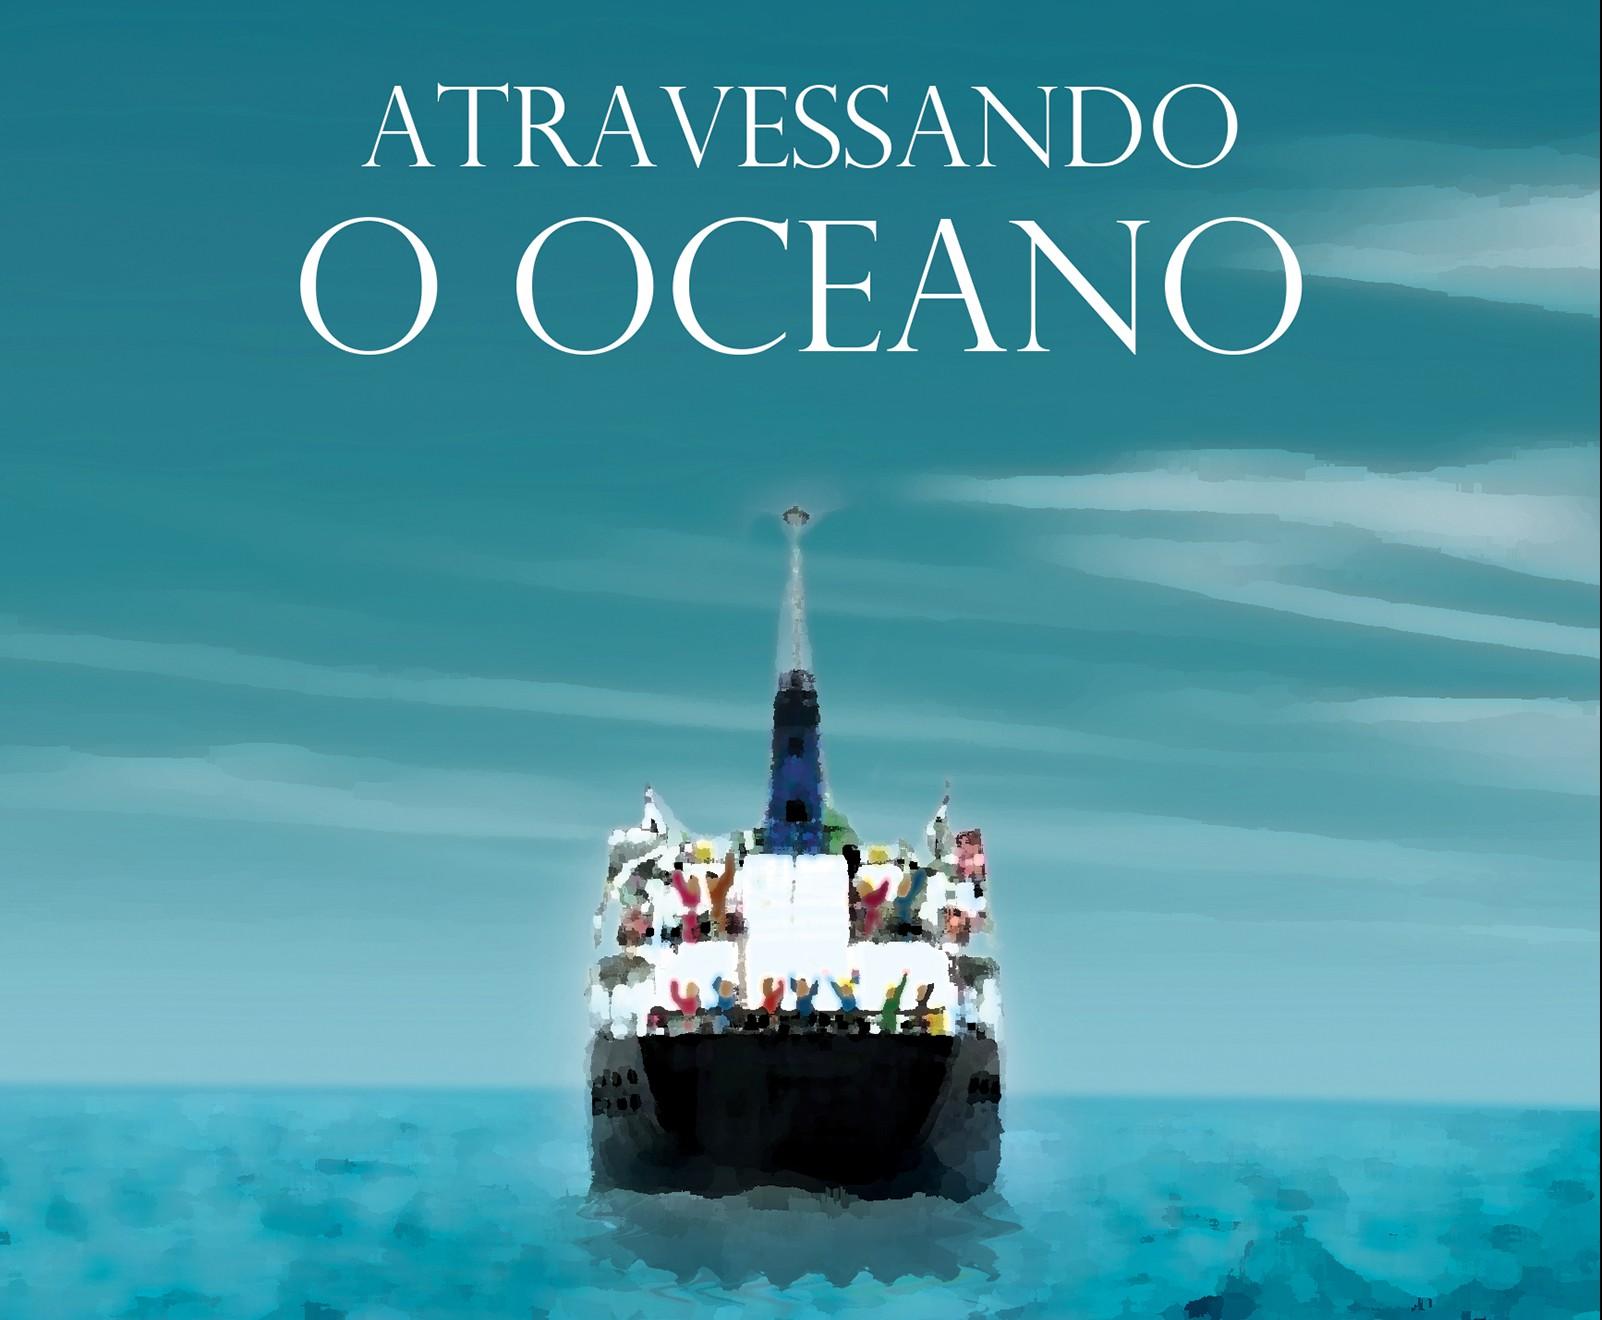 capaebookatravessando_o_oceano